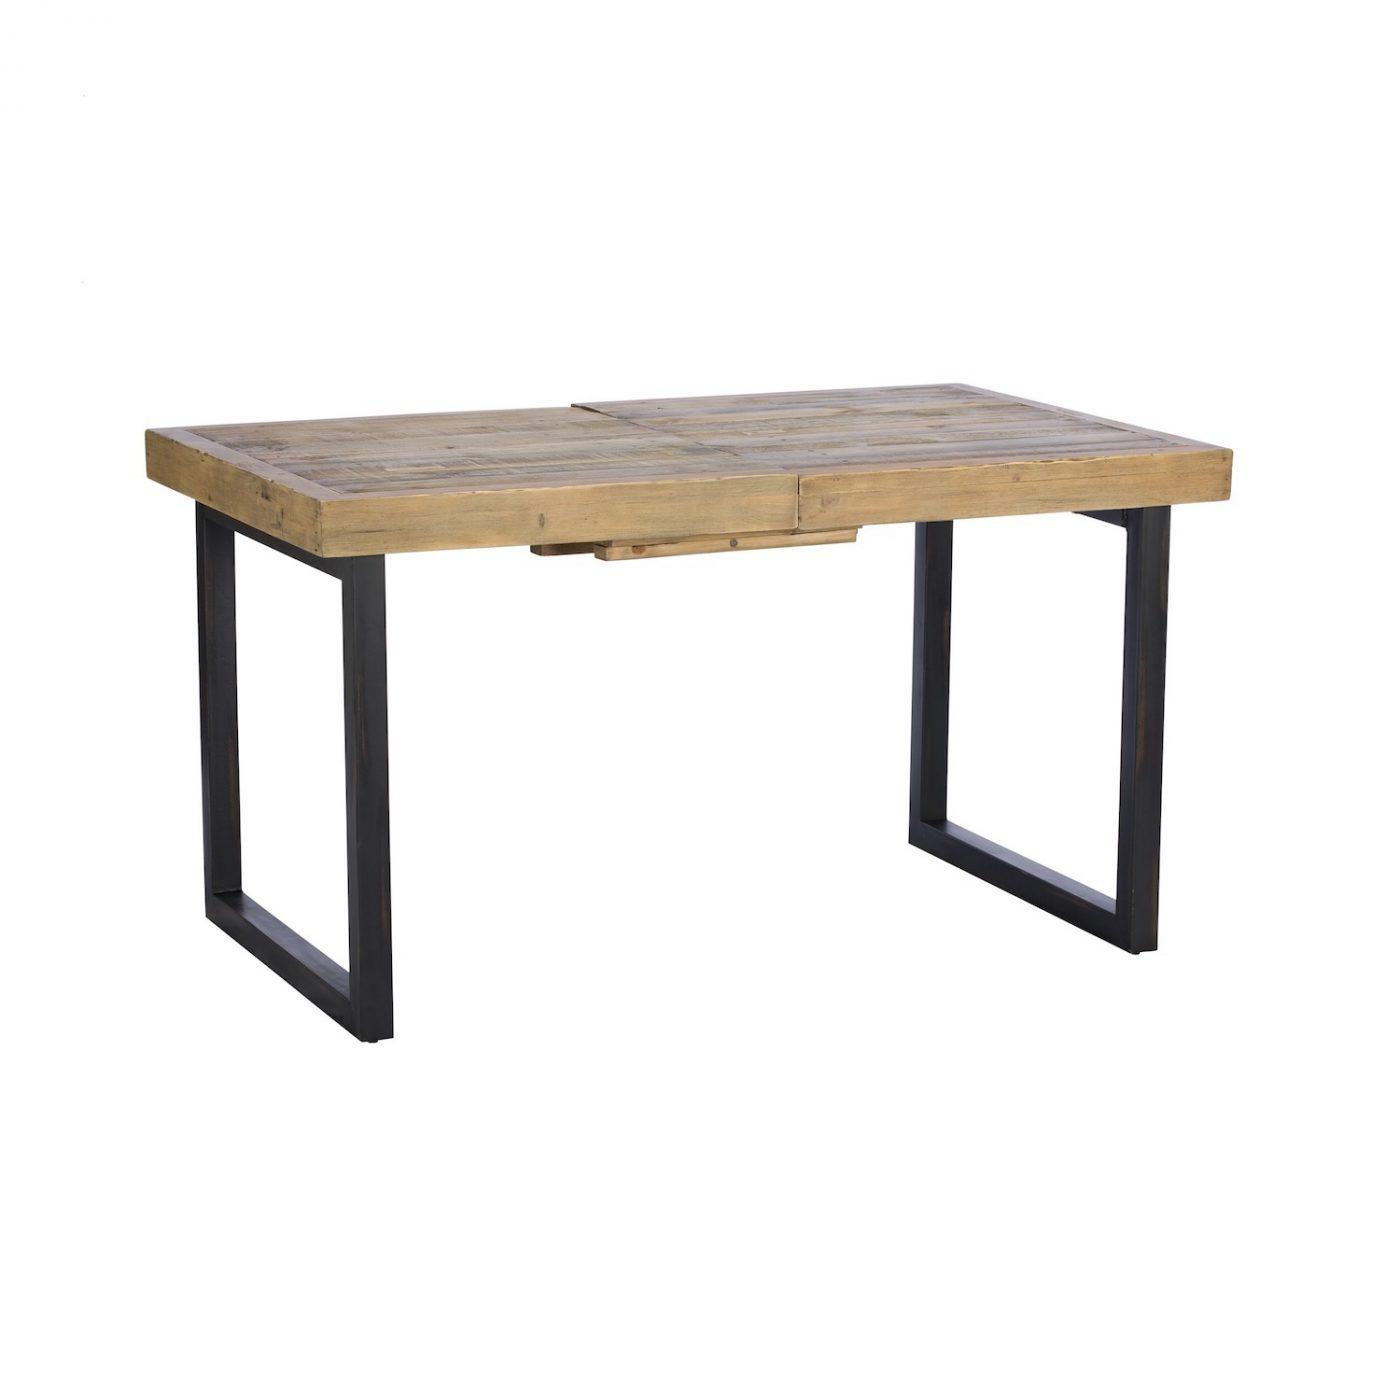 Newland 140cm-180cm Fully Extending Dining Table